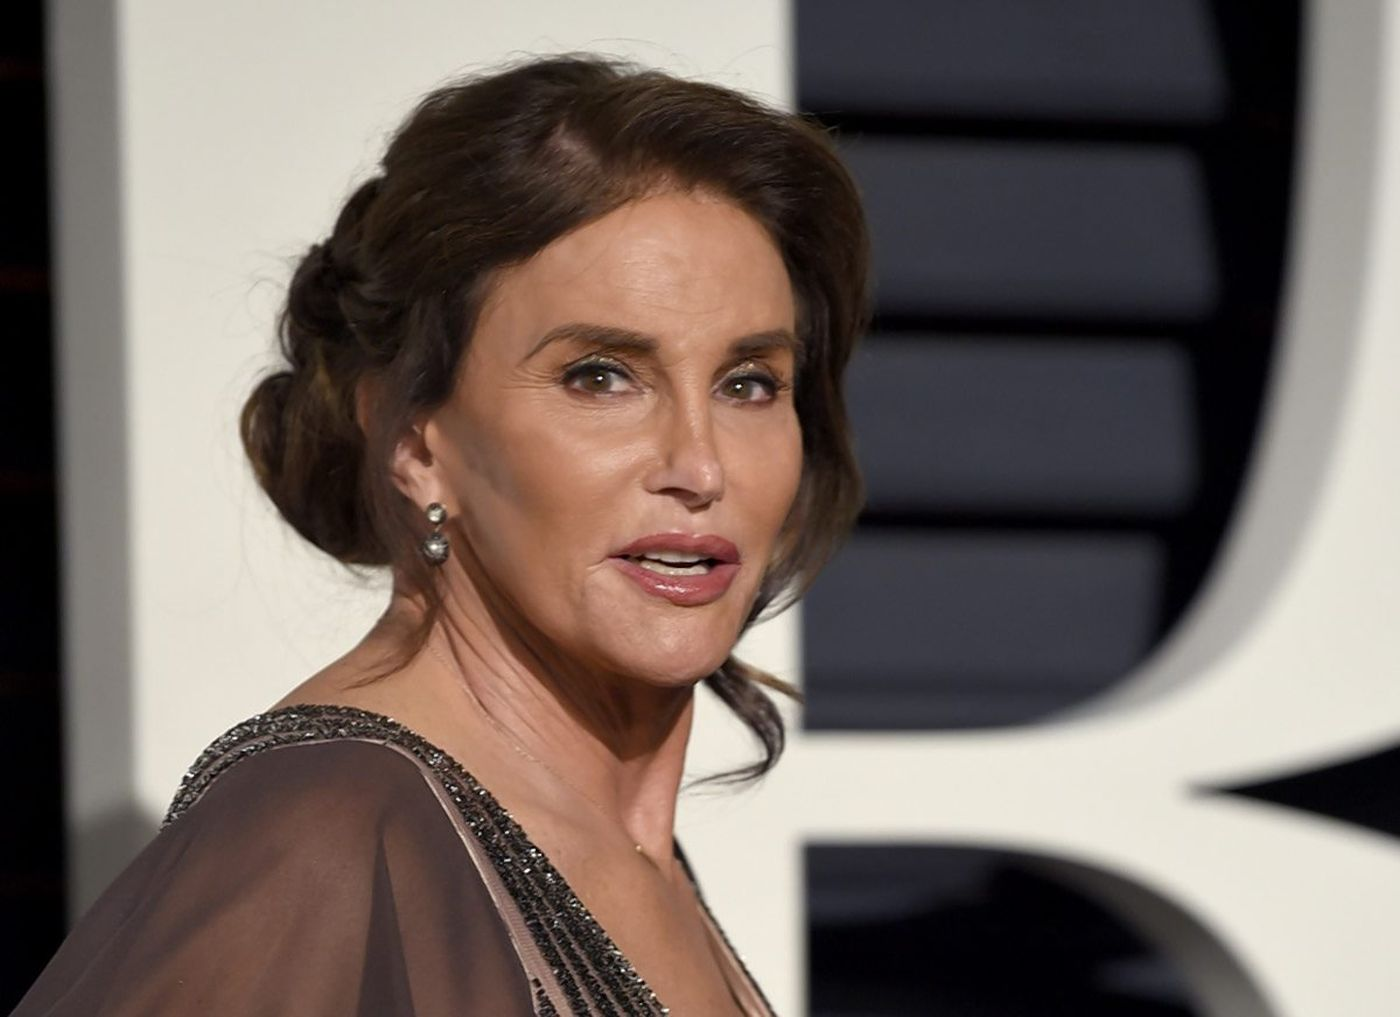 Caitlyn Jenner retira su apoyo a Donald Trump: